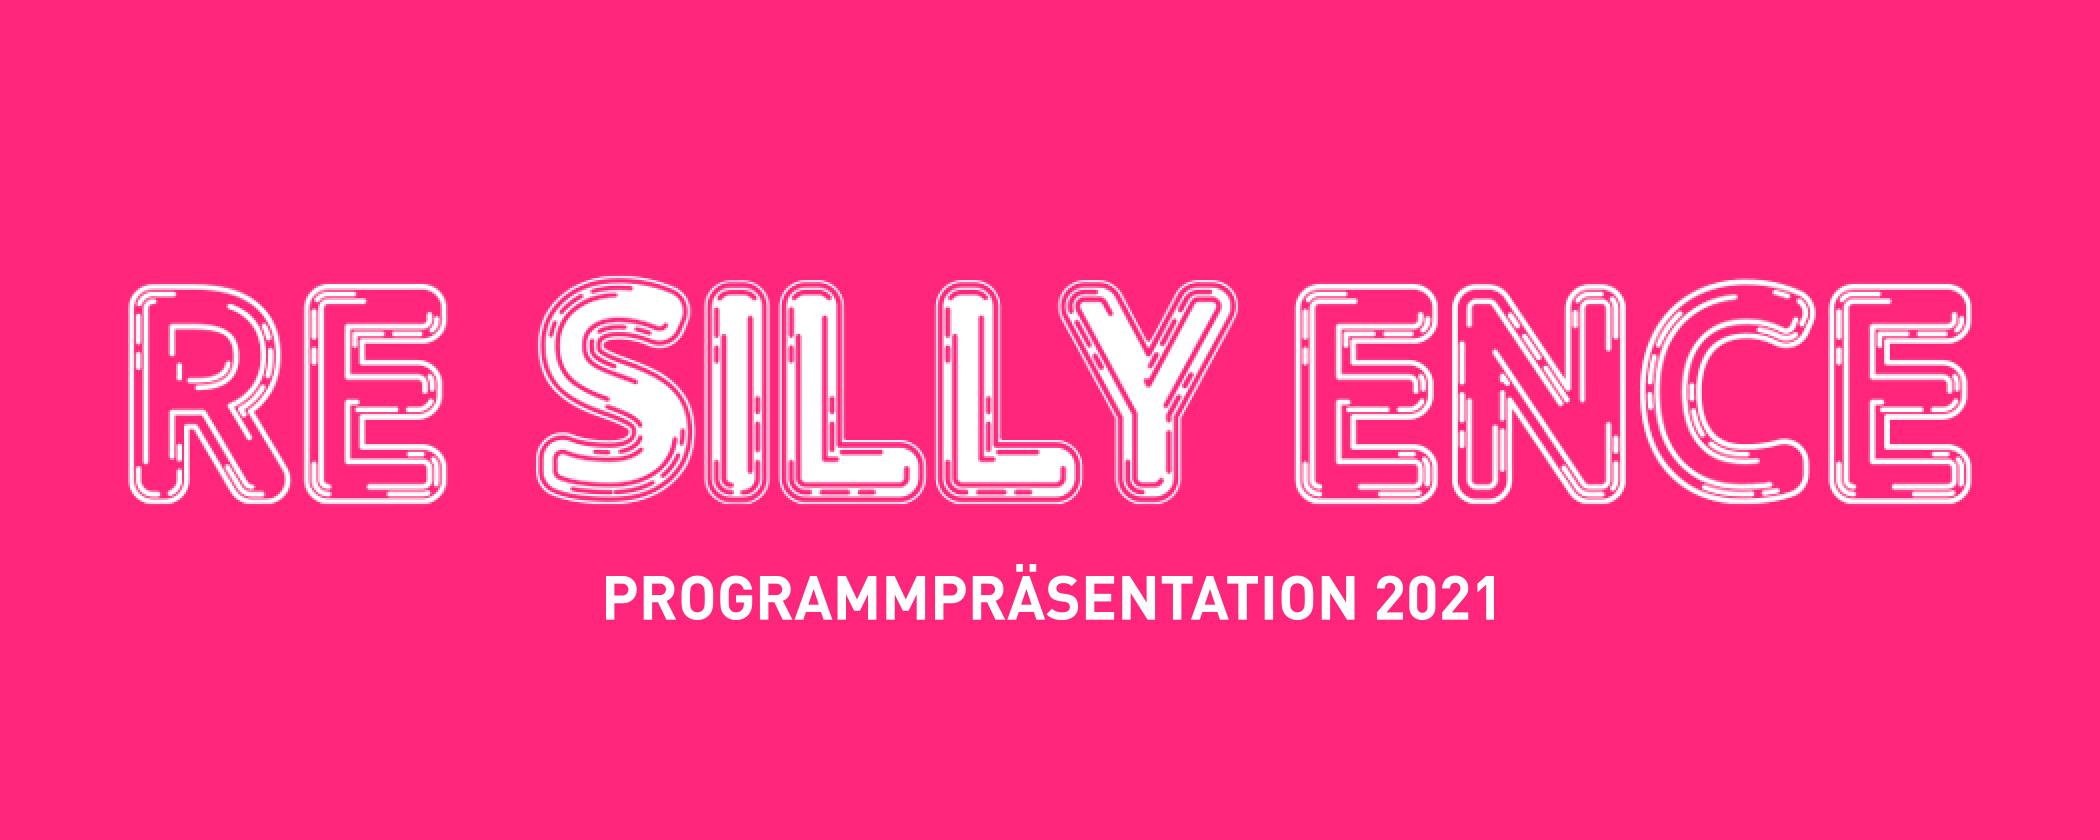 re_silly_ence © Andrea Lehsiak © re_silly_ence, graphic design: Andrea Lehsiak